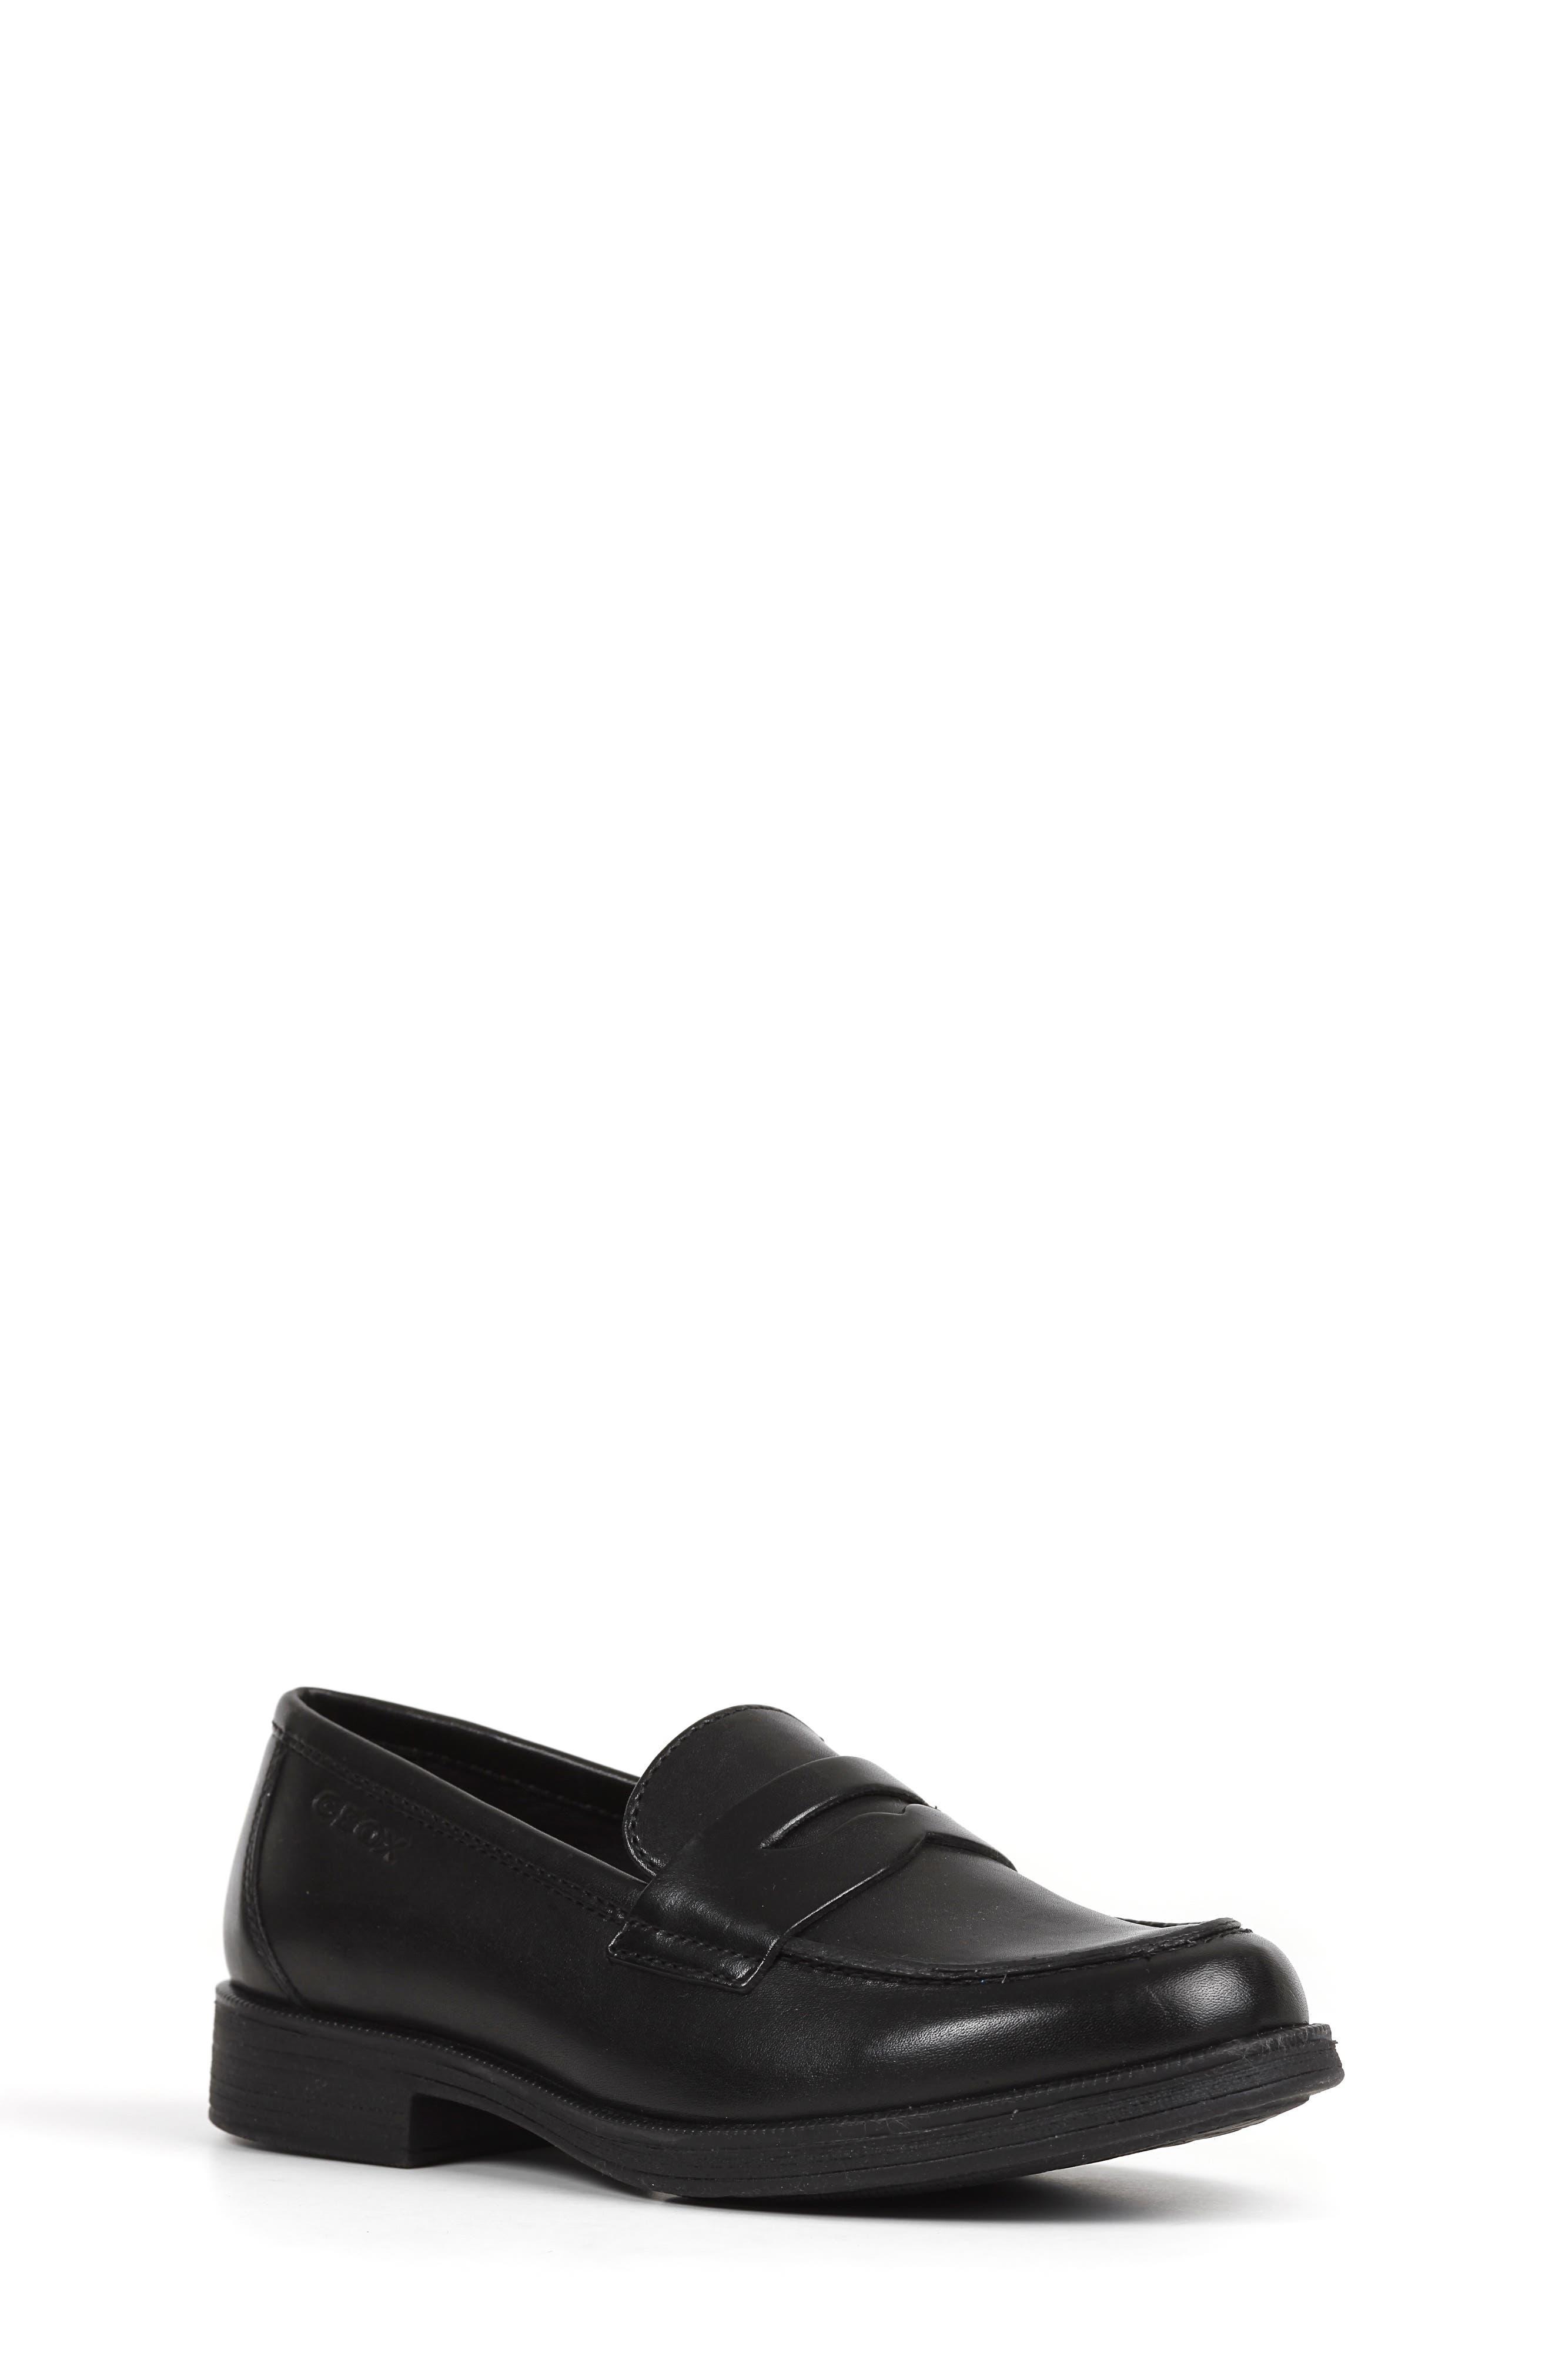 Agata 1 Penny Loafer,                             Main thumbnail 1, color,                             BLACK